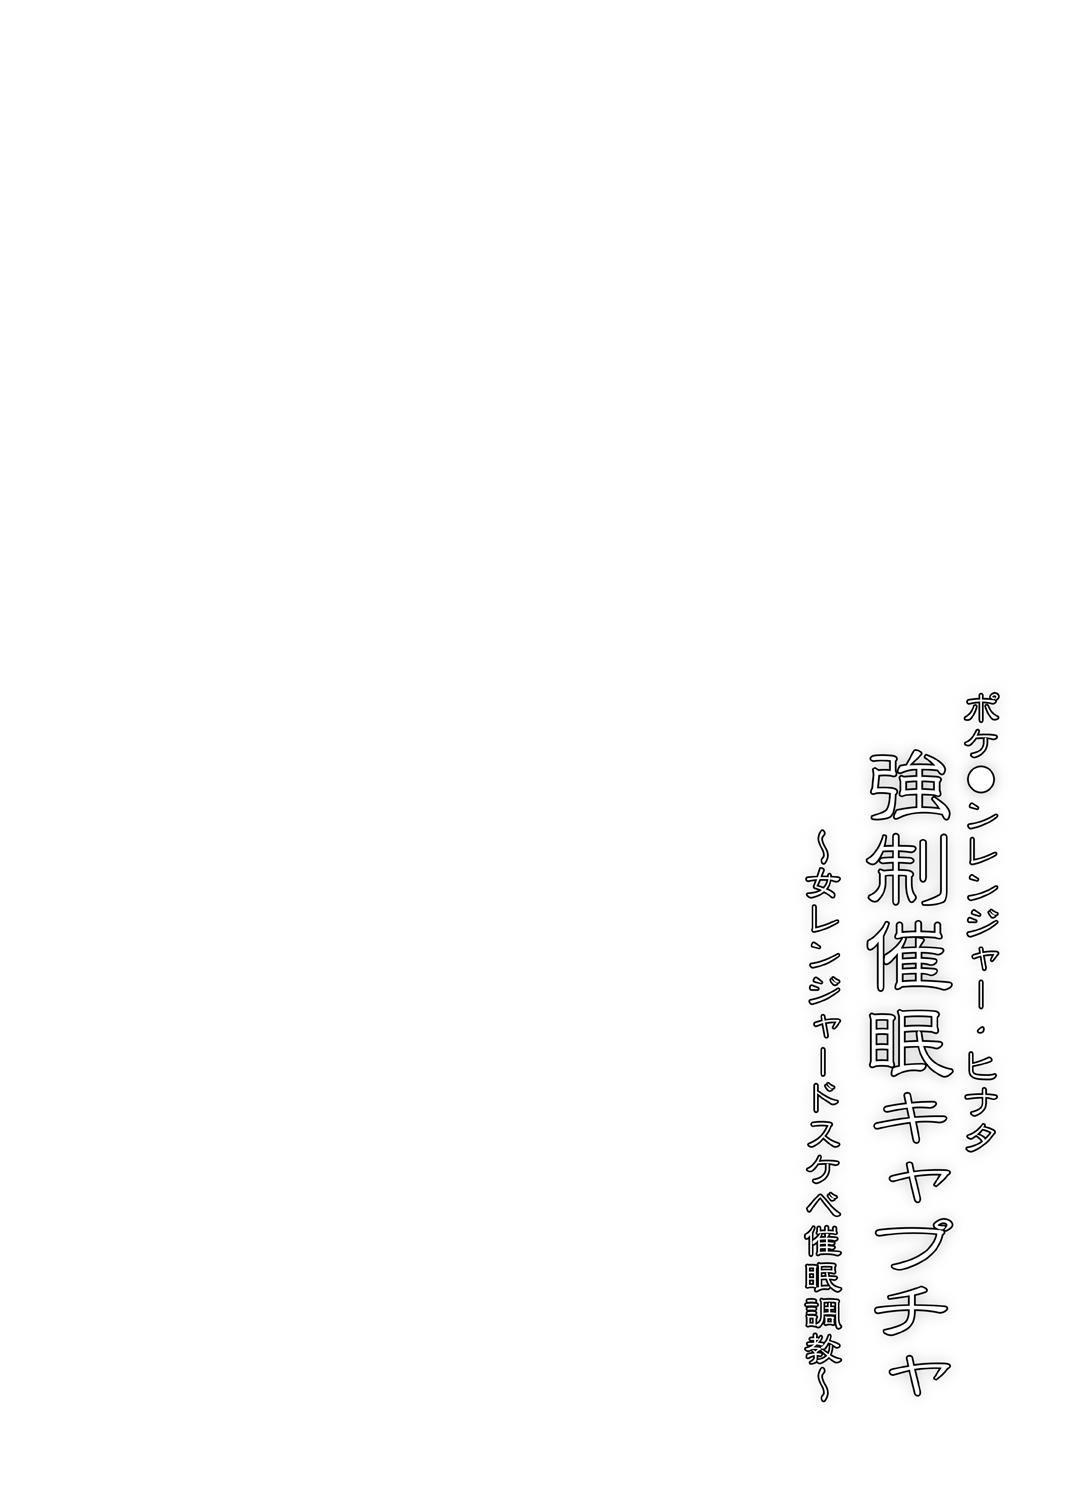 [Stapspats (Hisui)] Pokémon Ranger Hinata Kyousei Saimin Capture ~Onna Ranger Dosukebe Saimin Choukyou~ | Pokémon Ranger Solana's Forced Hypnosis Capture ~Female Ranger's Sexual Hypnosis Training~ (Pokémon) [Digital] [English] 3